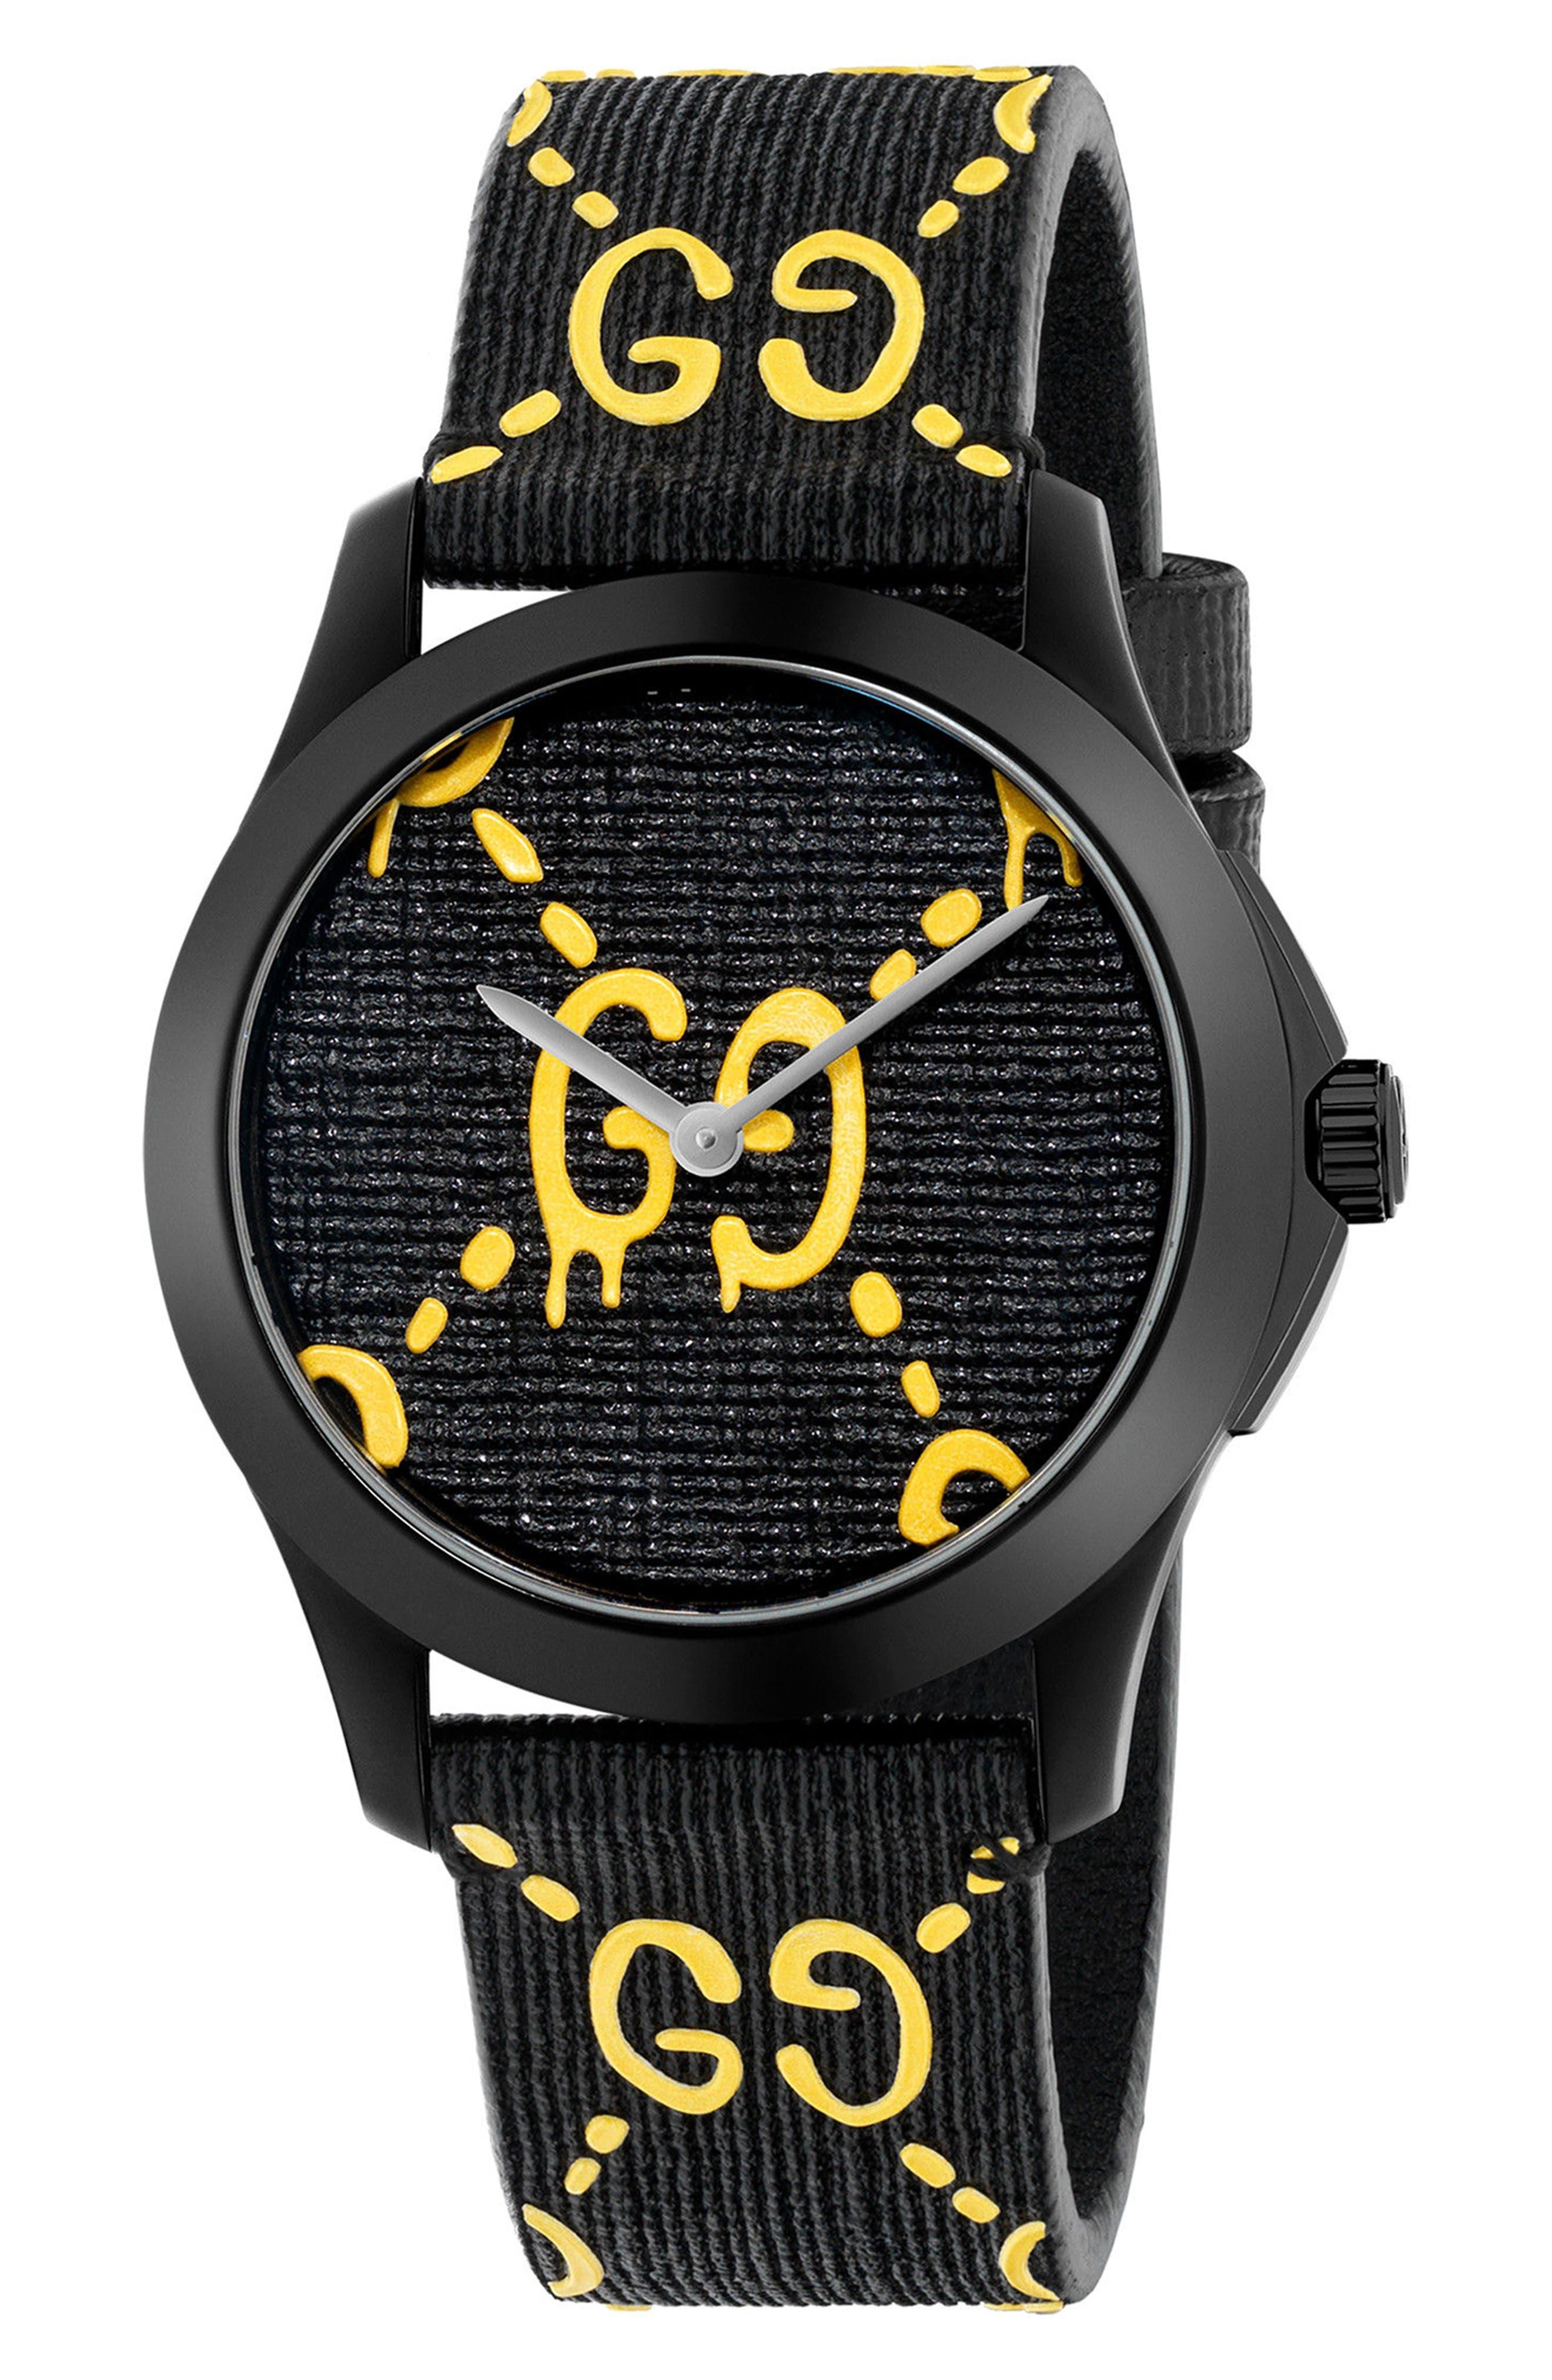 Main Image - Gucci GG Rubber Strap Watch, 38mm